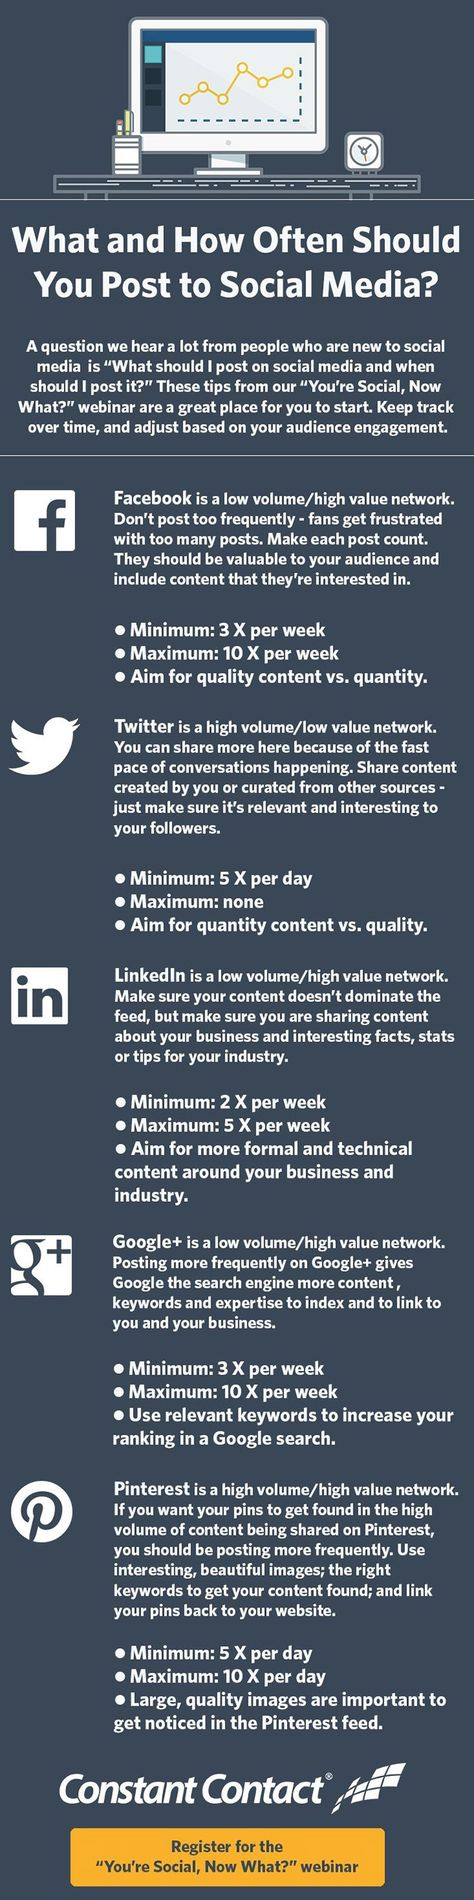 How Often Should I Post to Social Media? | Brandignity